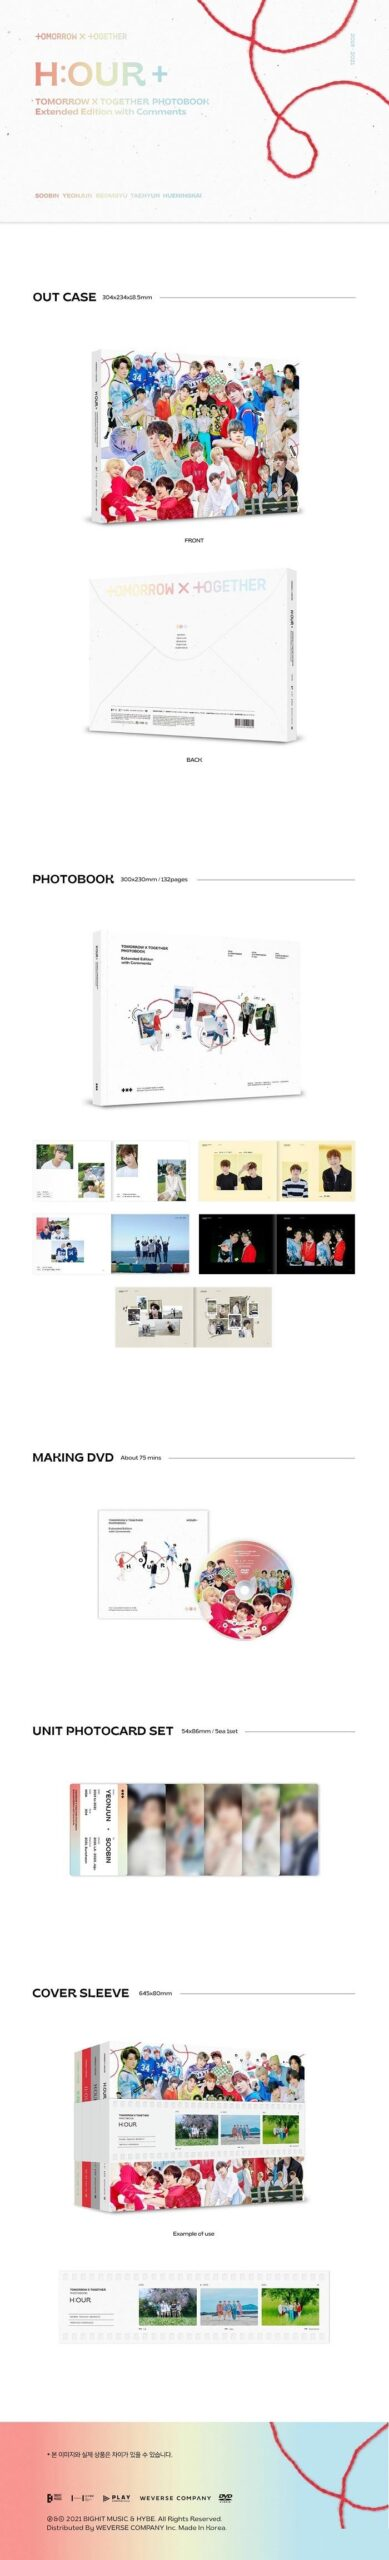 TXT The 3rd Photobook HOUR In Suncheon 2.1